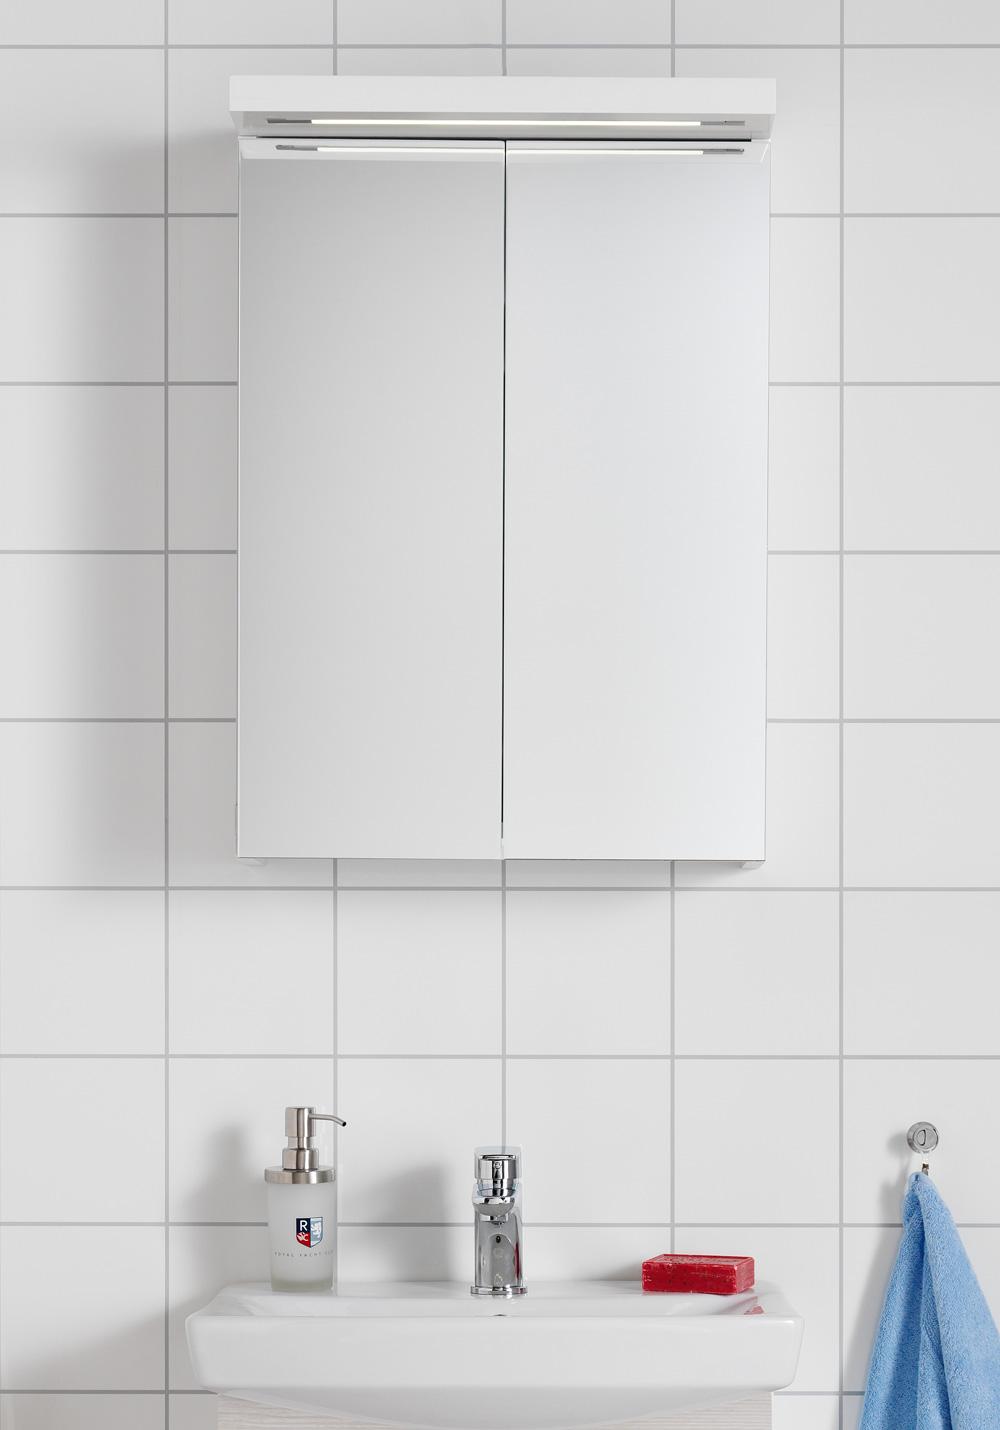 Hafa badrumsskåp belysning u2013 Spegel med belysning